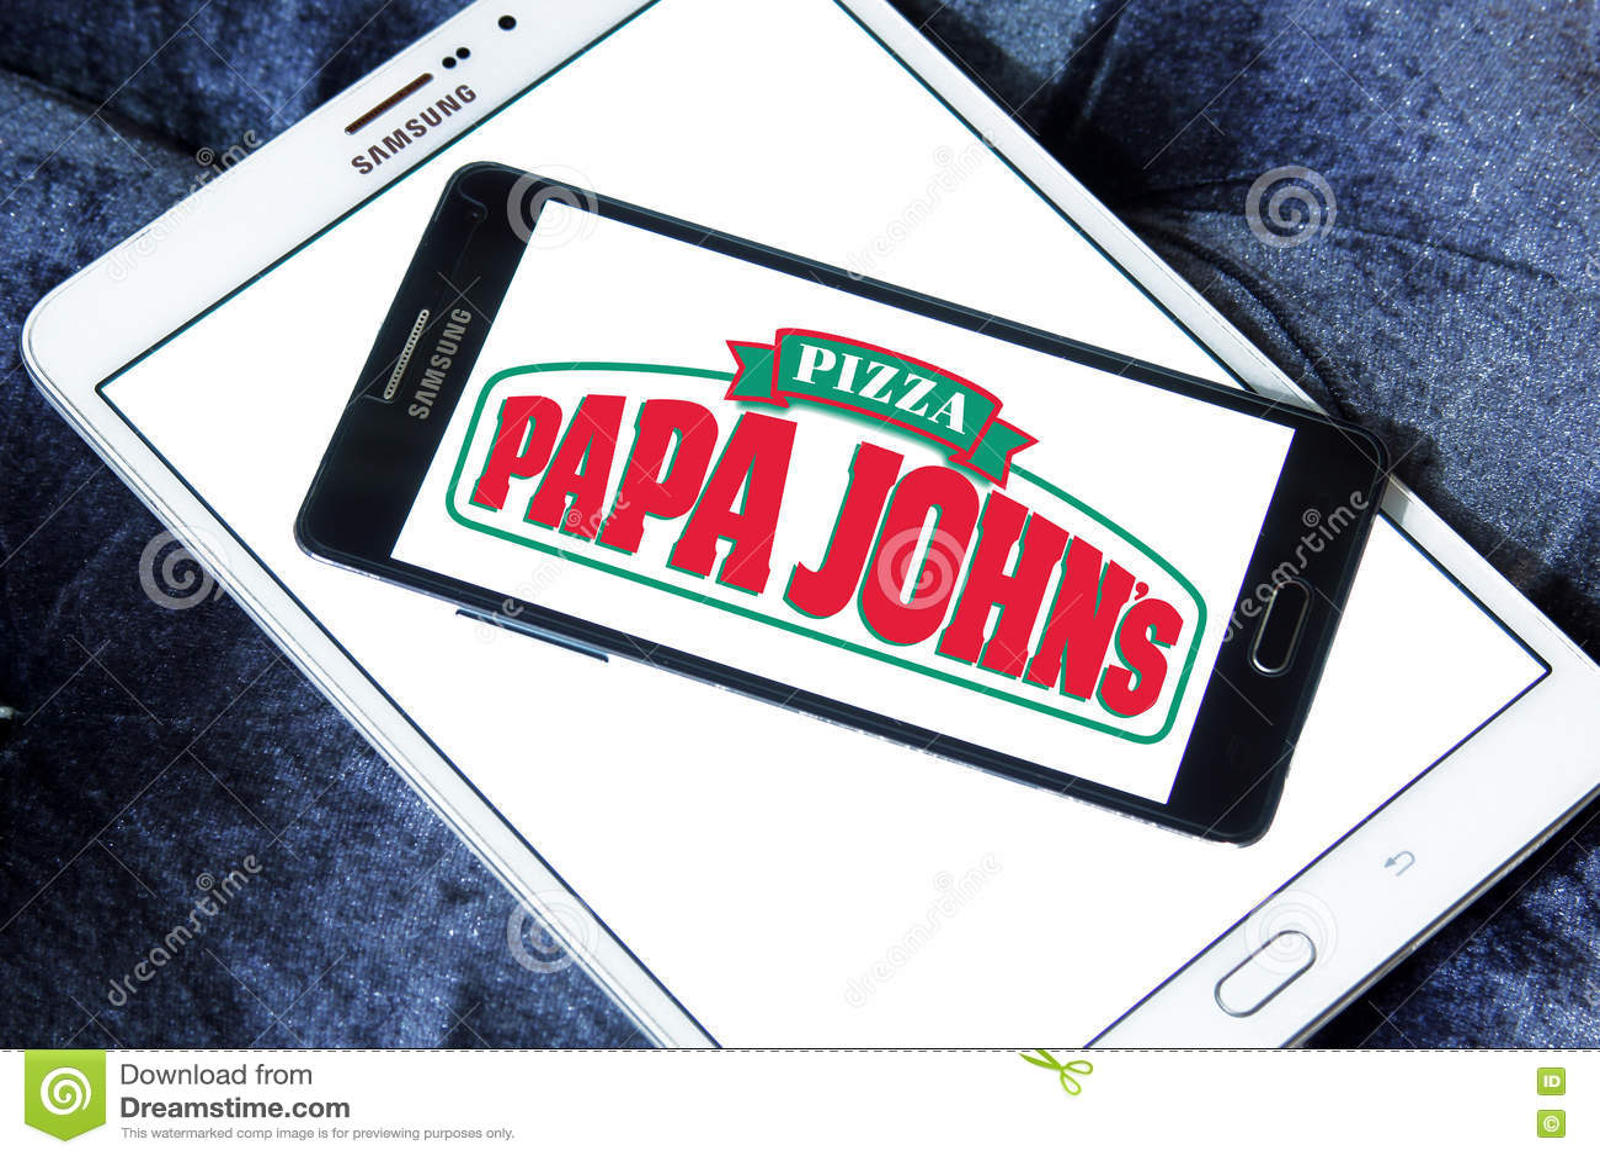 Papa johns pizza logo editorial stock photo. Image of mobile - 77058753